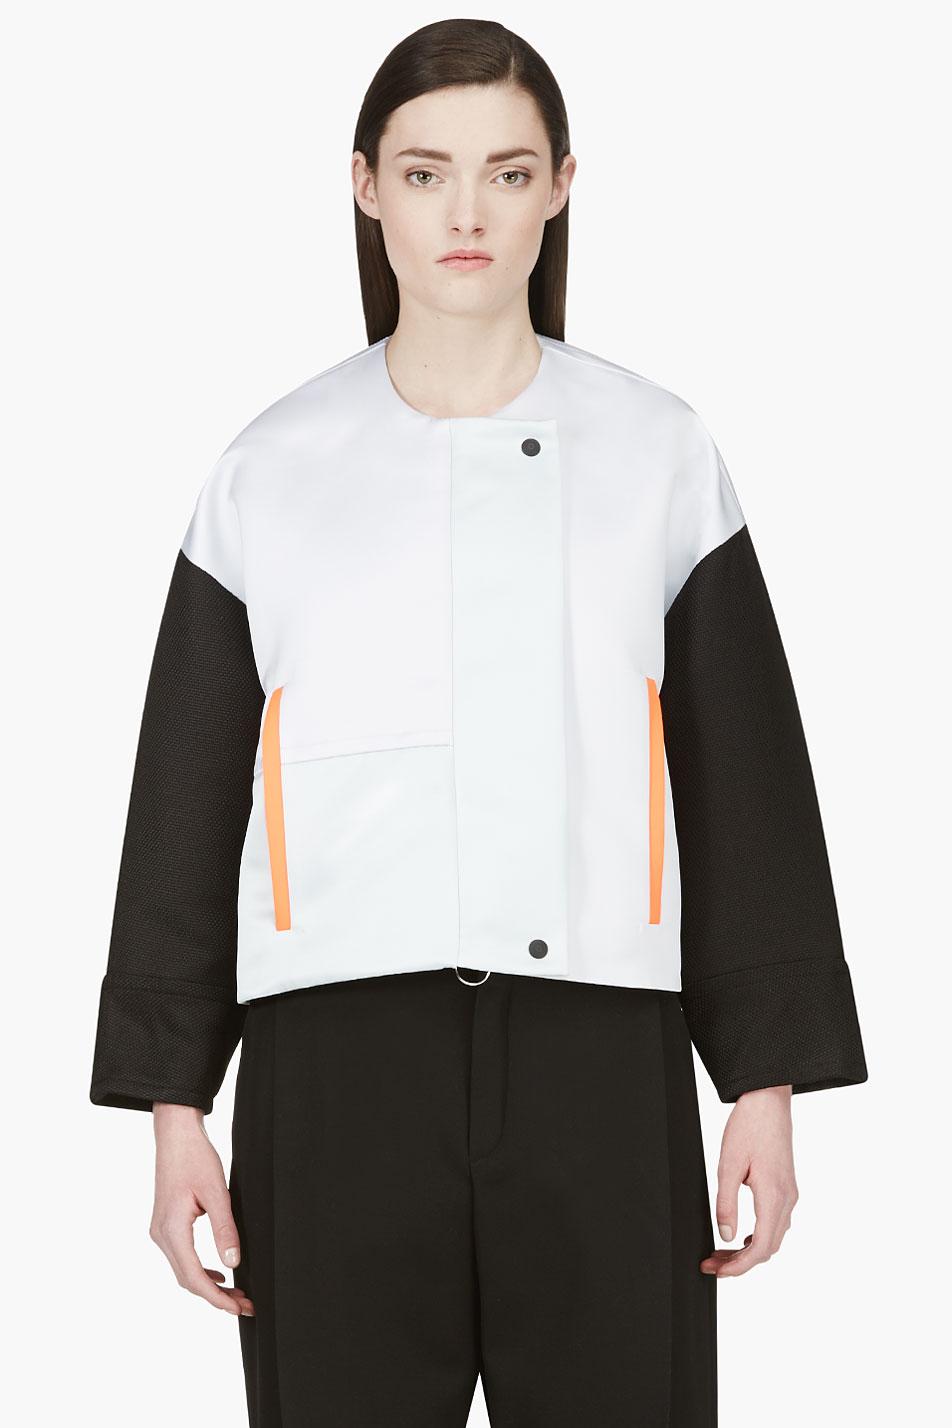 roksanda ilincic oyster grey and black bayliss jacket